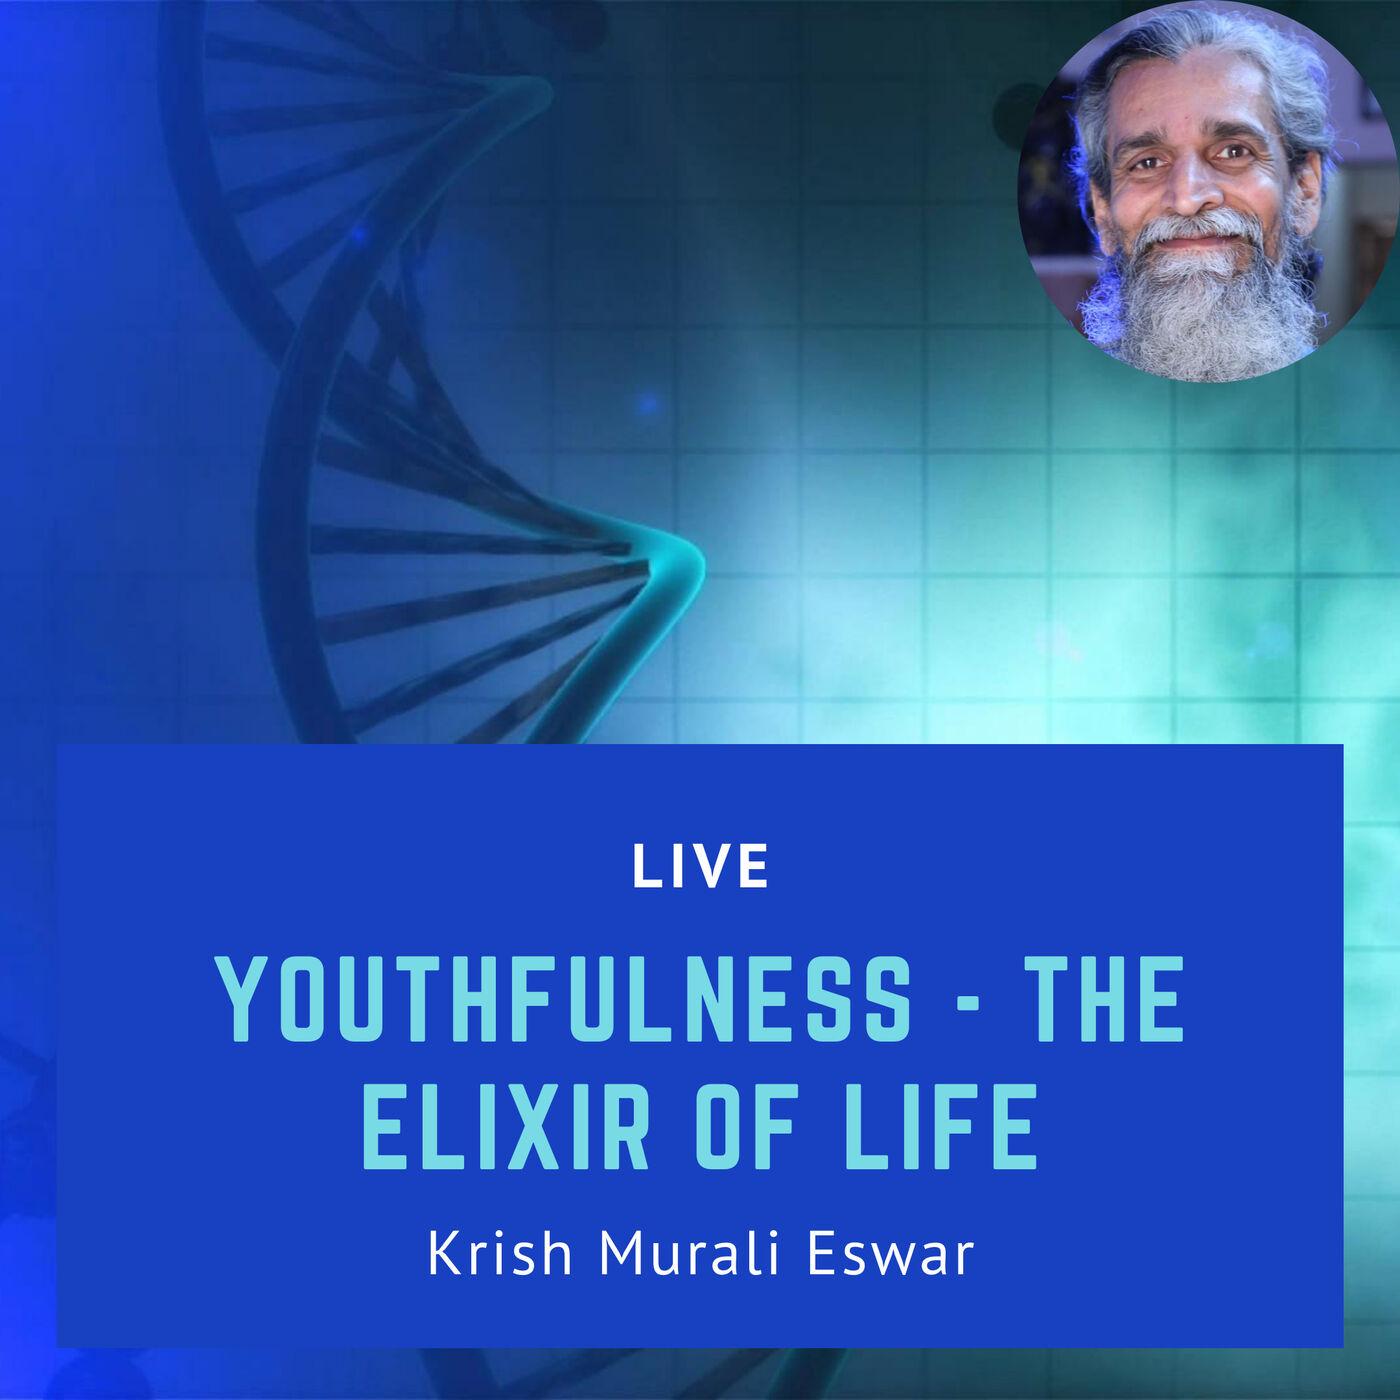 099 Youthfulness - The Elixir of Life